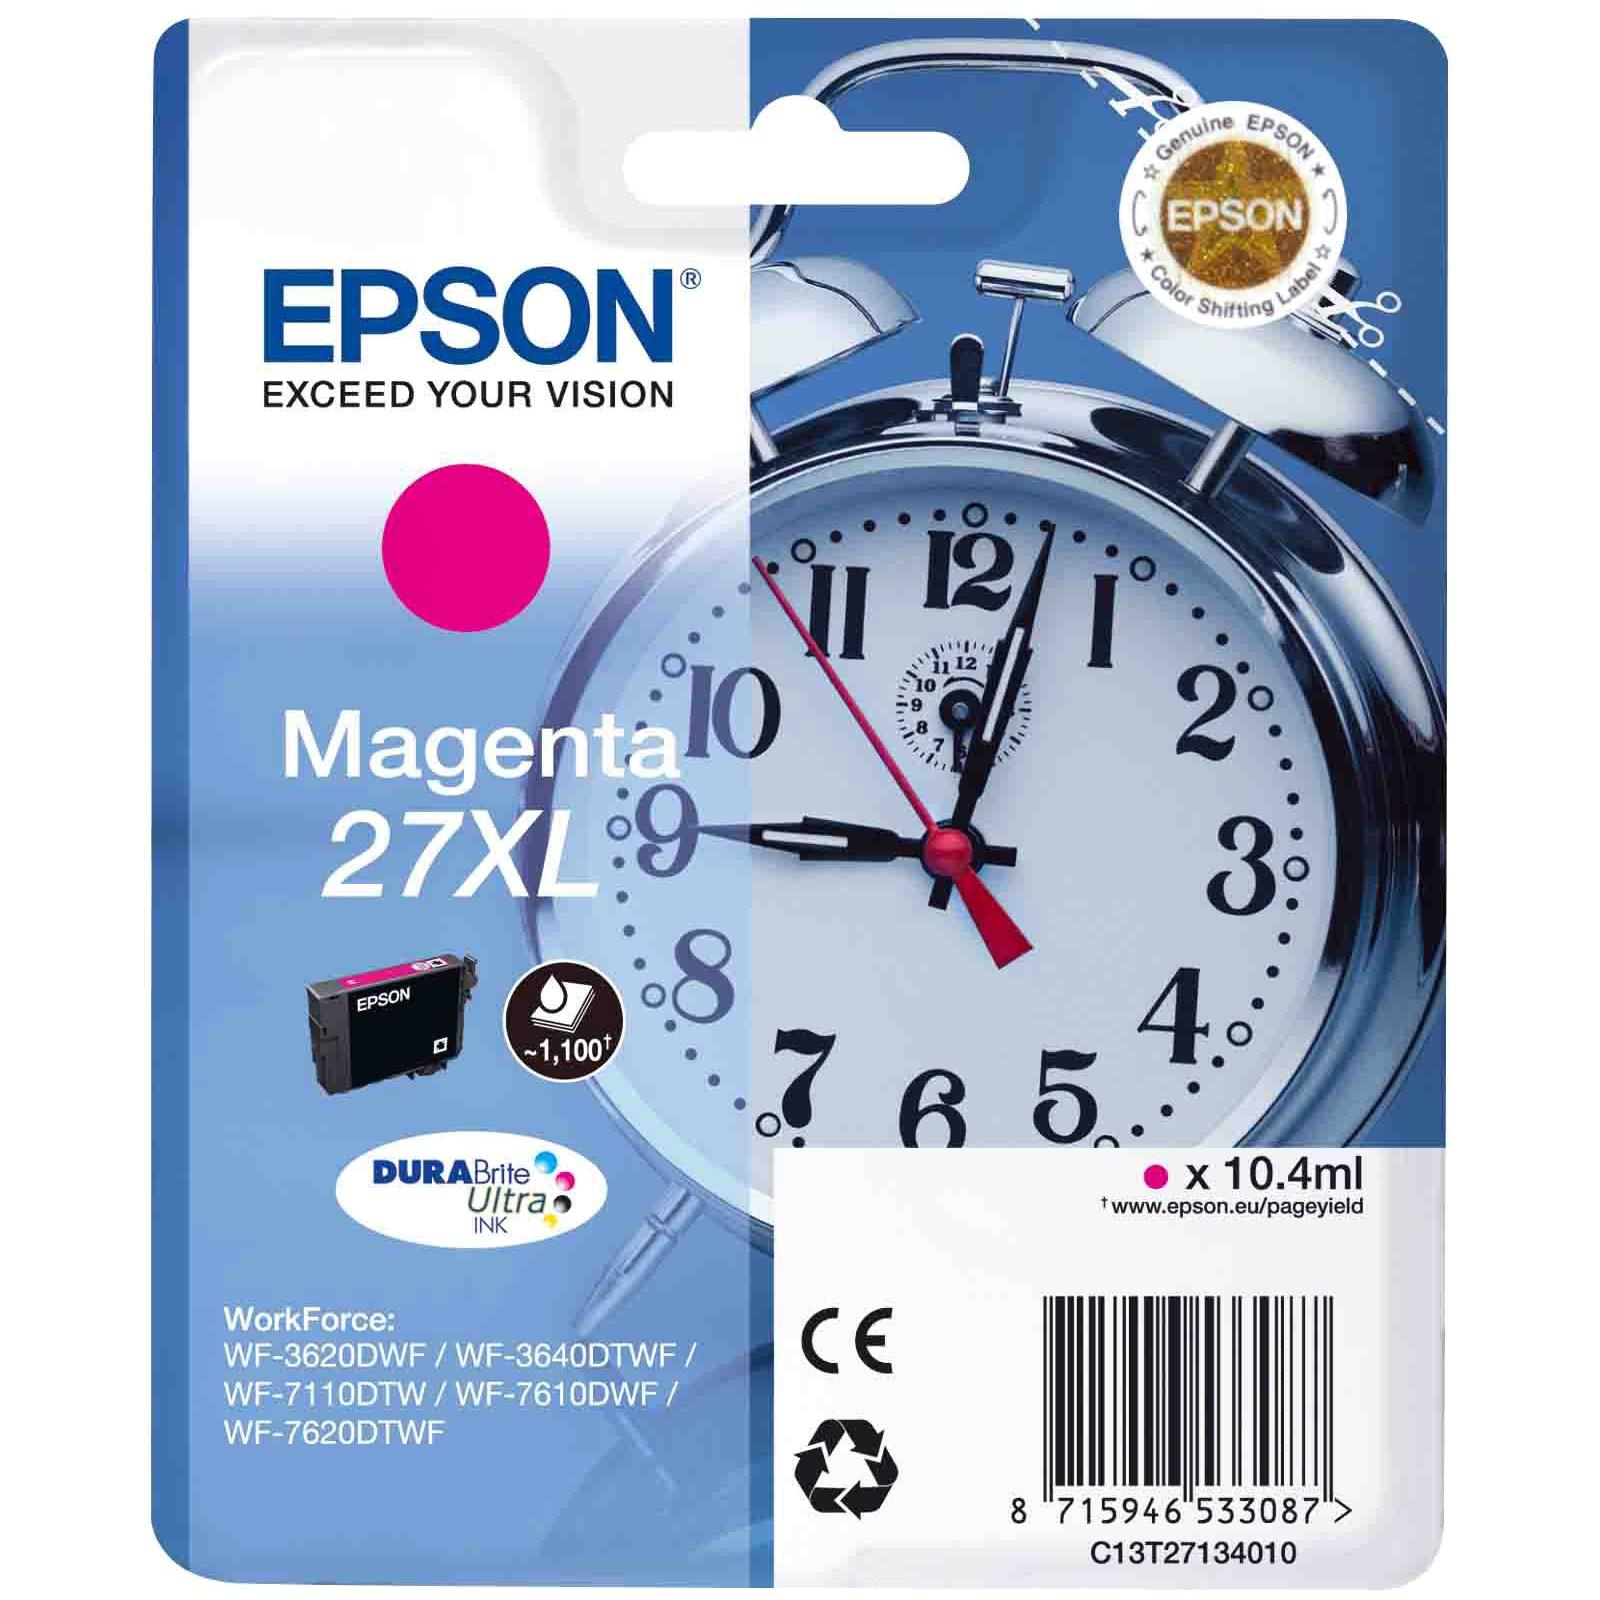 Картридж EPSON 27XL WF-7620 magenta XL (C13T27134020/C13T27134022)